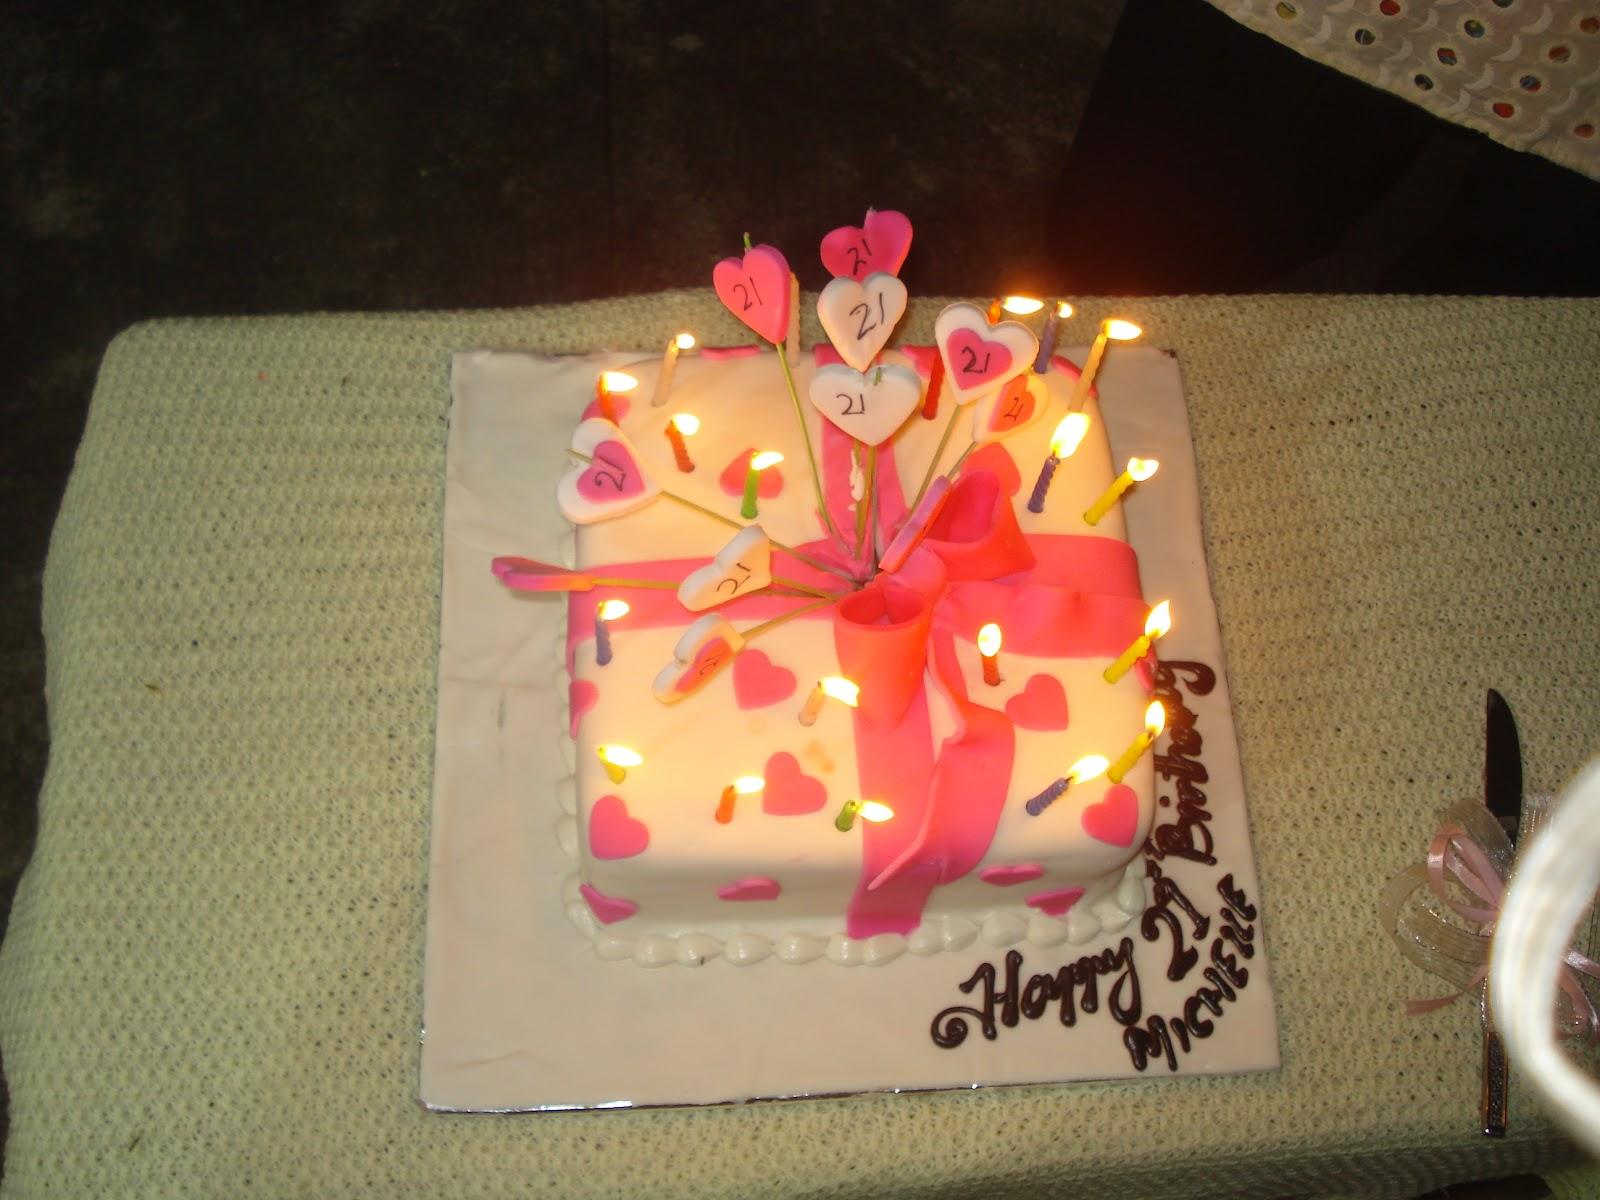 Avon Red Cake Plate